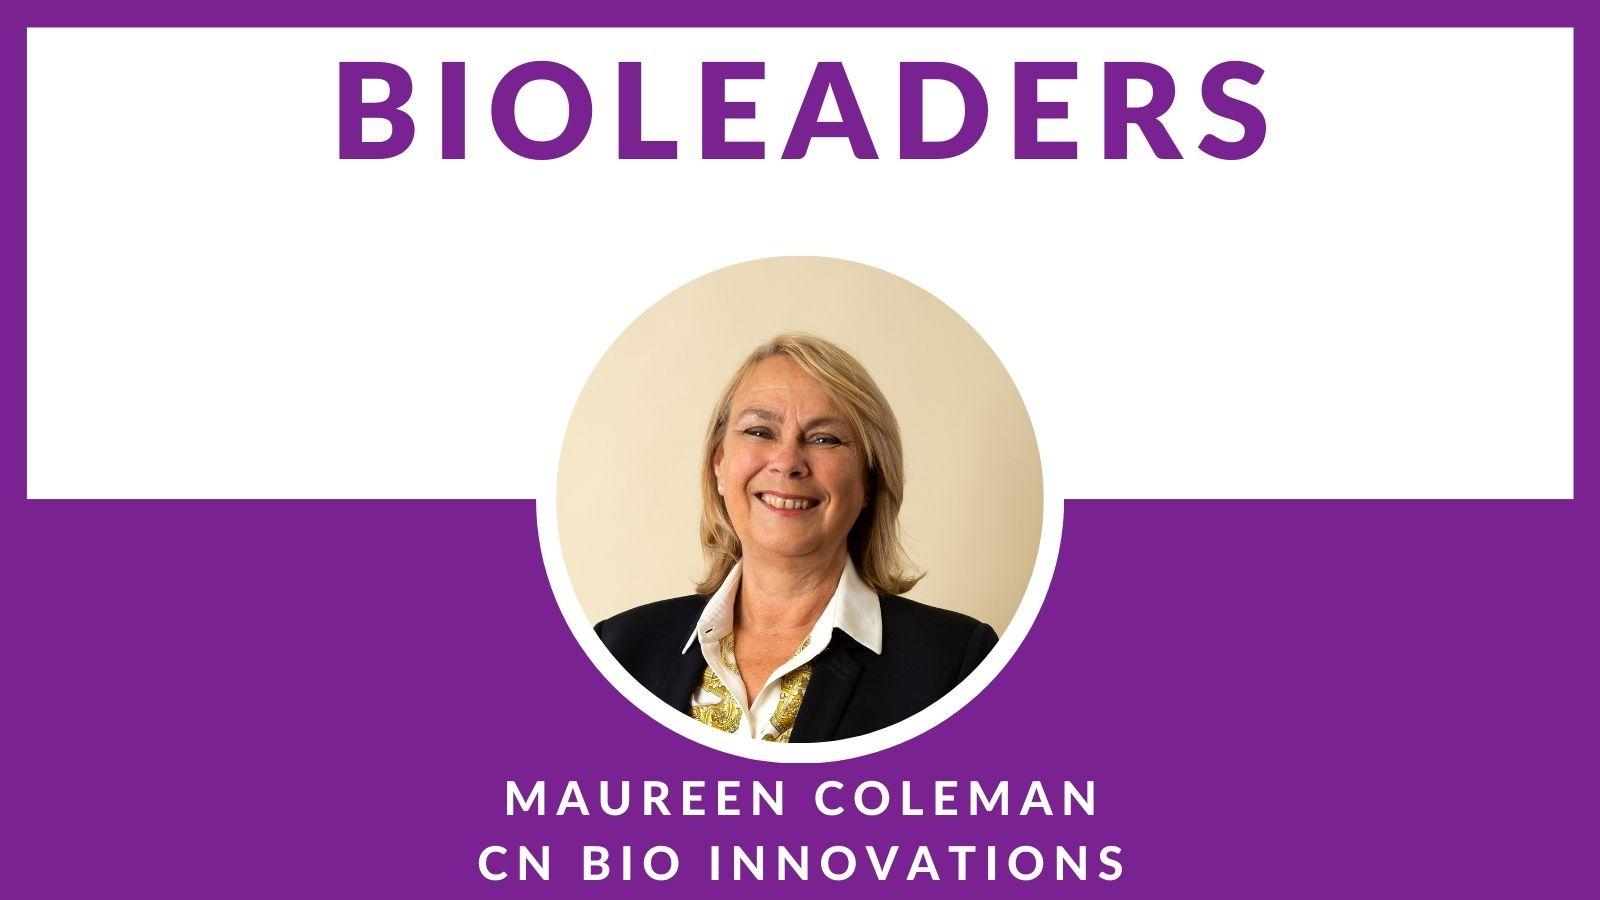 BioLeader Interviewee Maureen Coleman